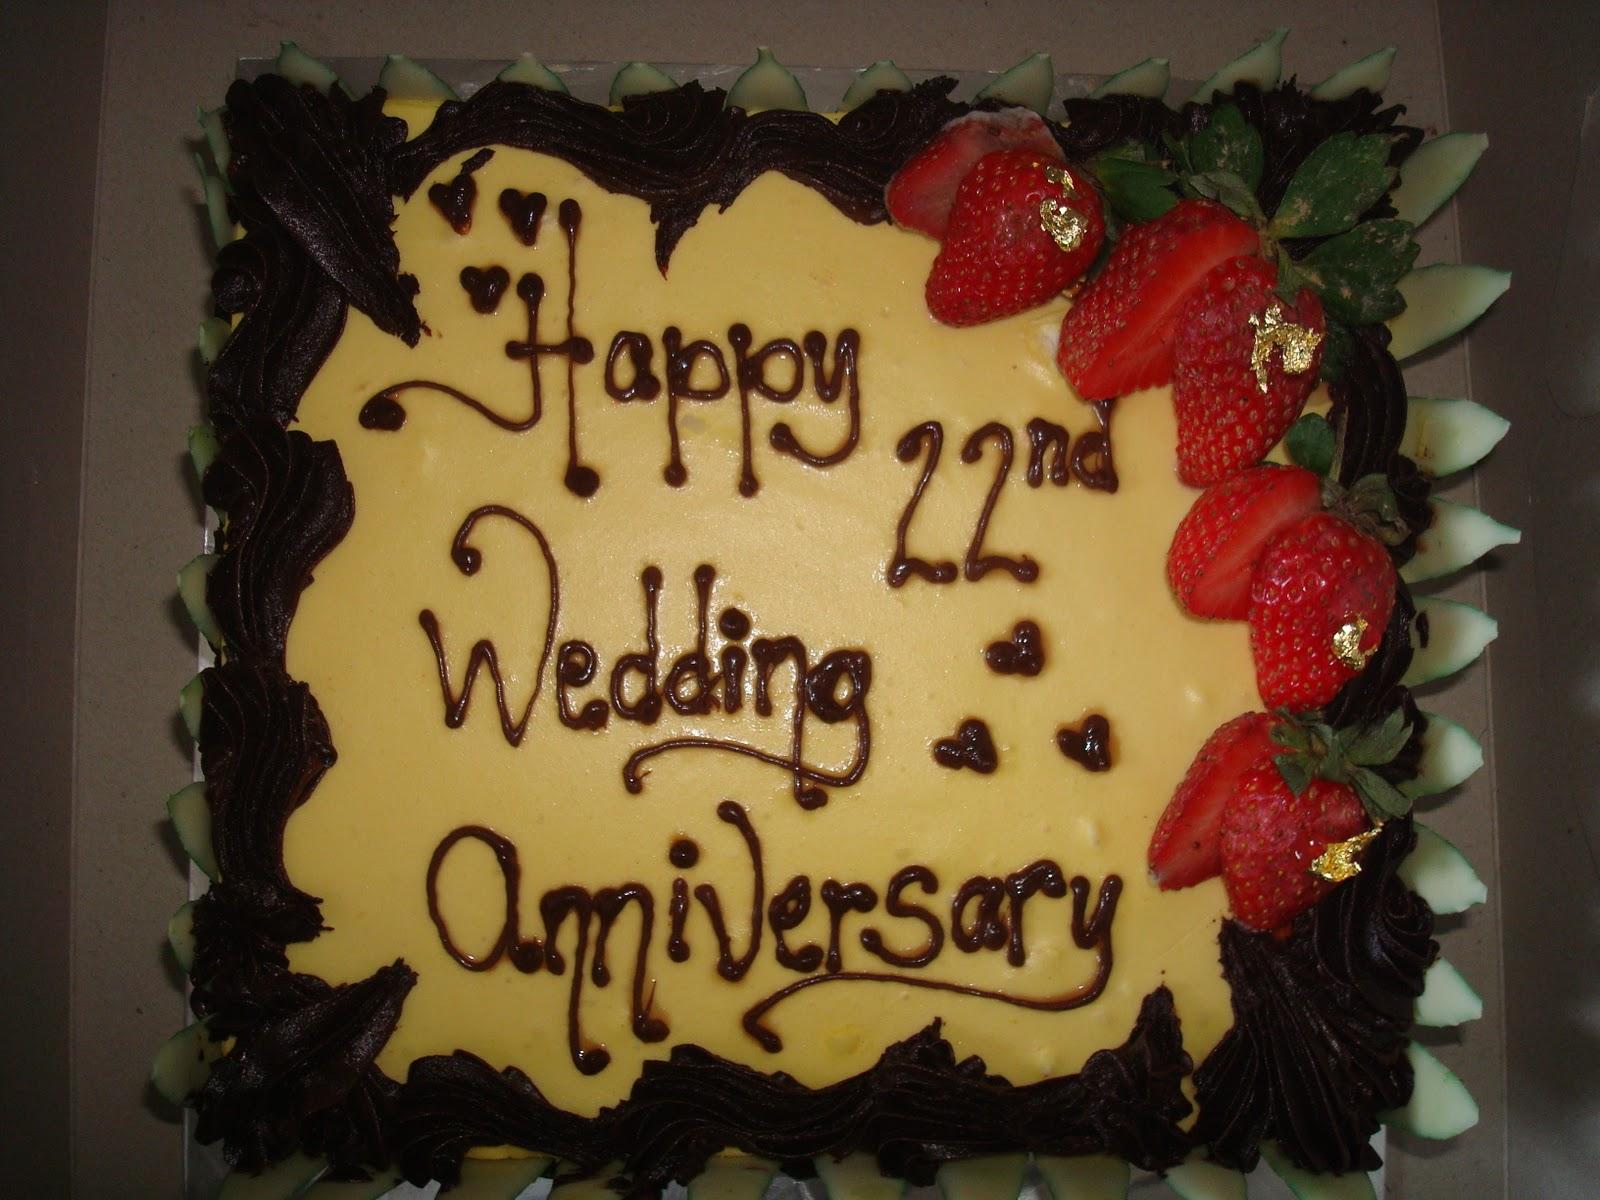 Happy Wedding Anniversary Cake Hd Images Naturallycurlye Com